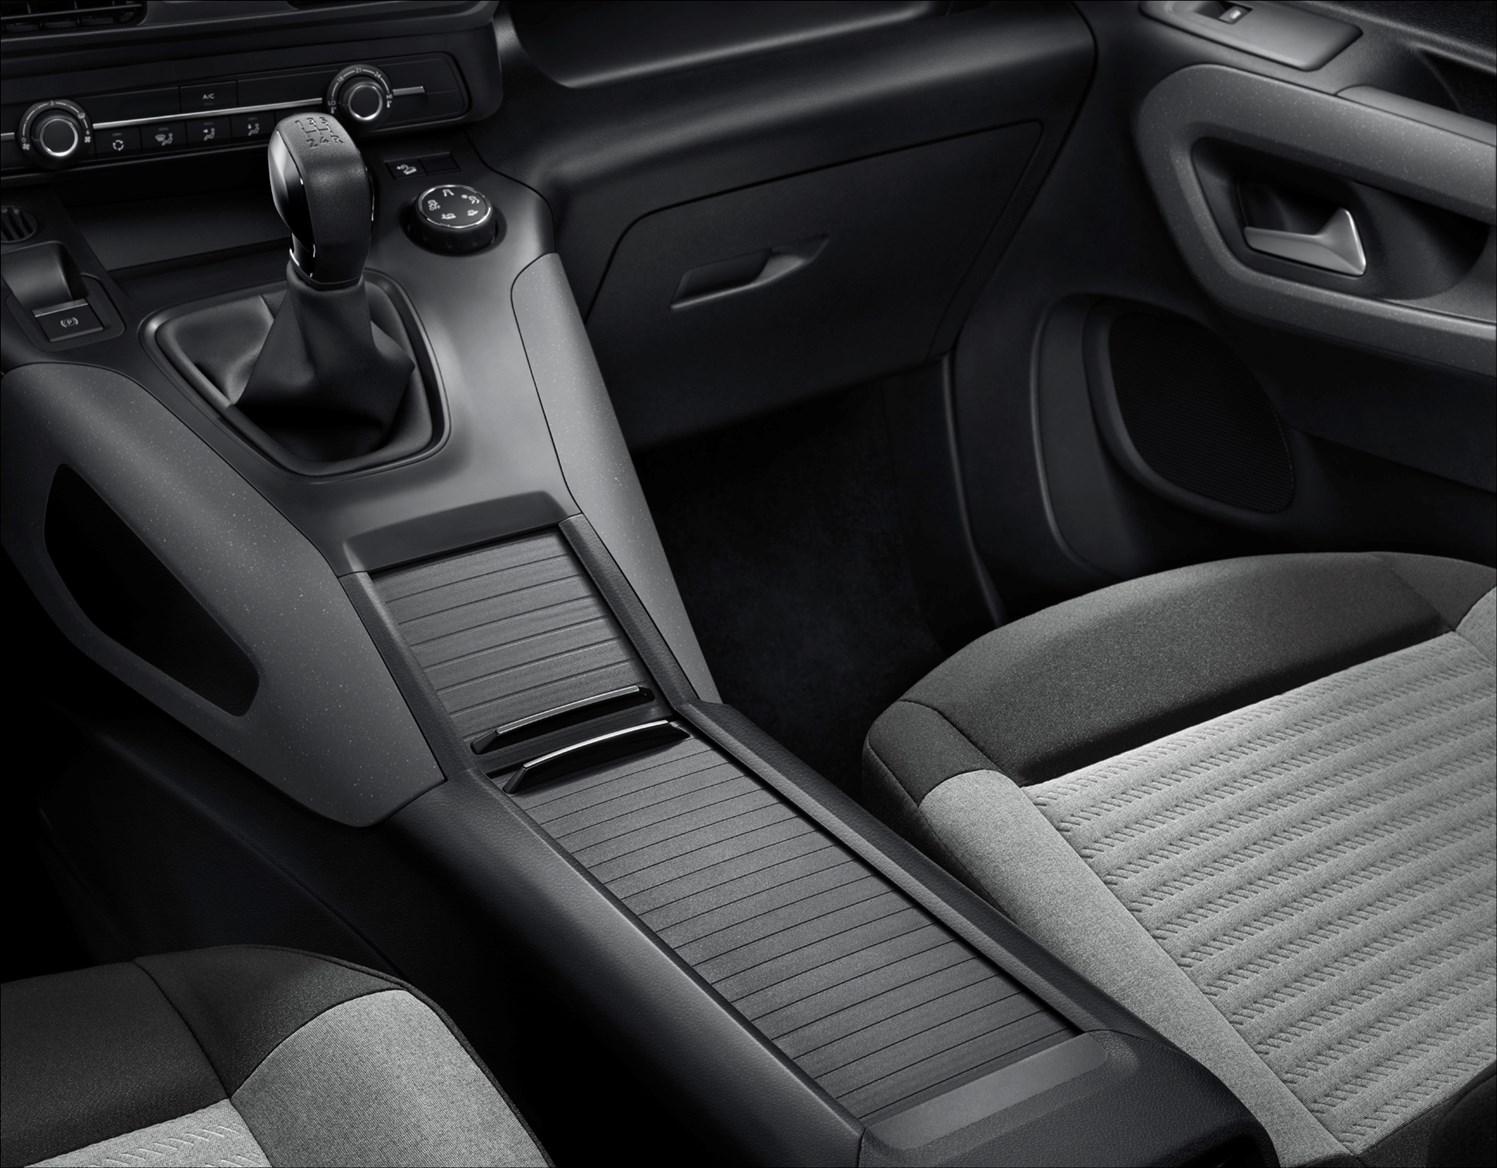 Citroen Berlingo Mpv Review Driving Parkers Fuse Box For Sale Interior Detail